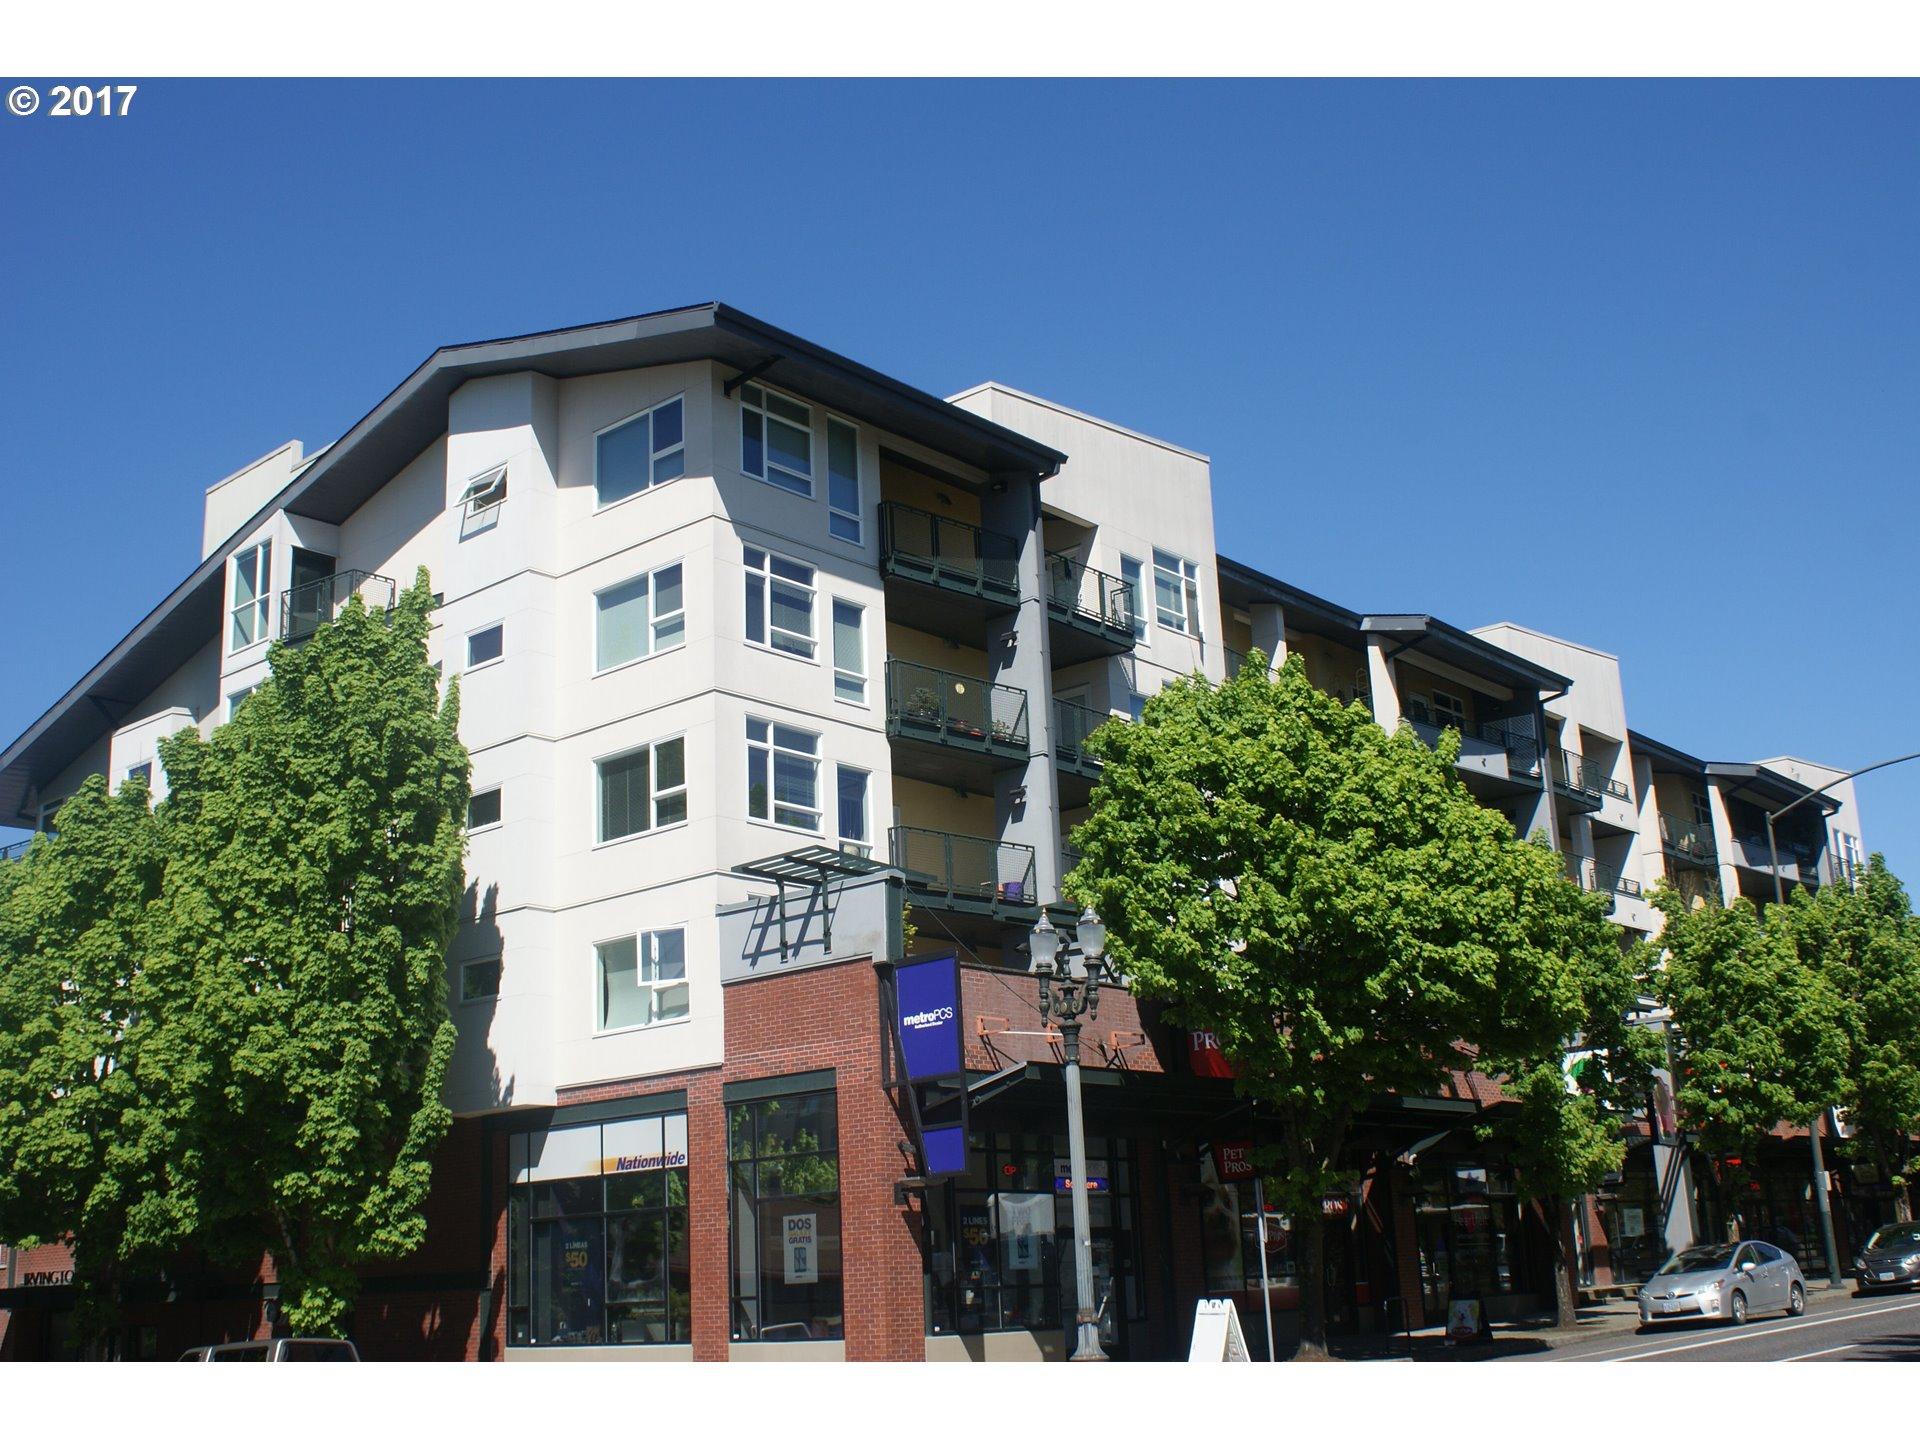 1718 NE 11TH AVE 301, Portland, OR 97212